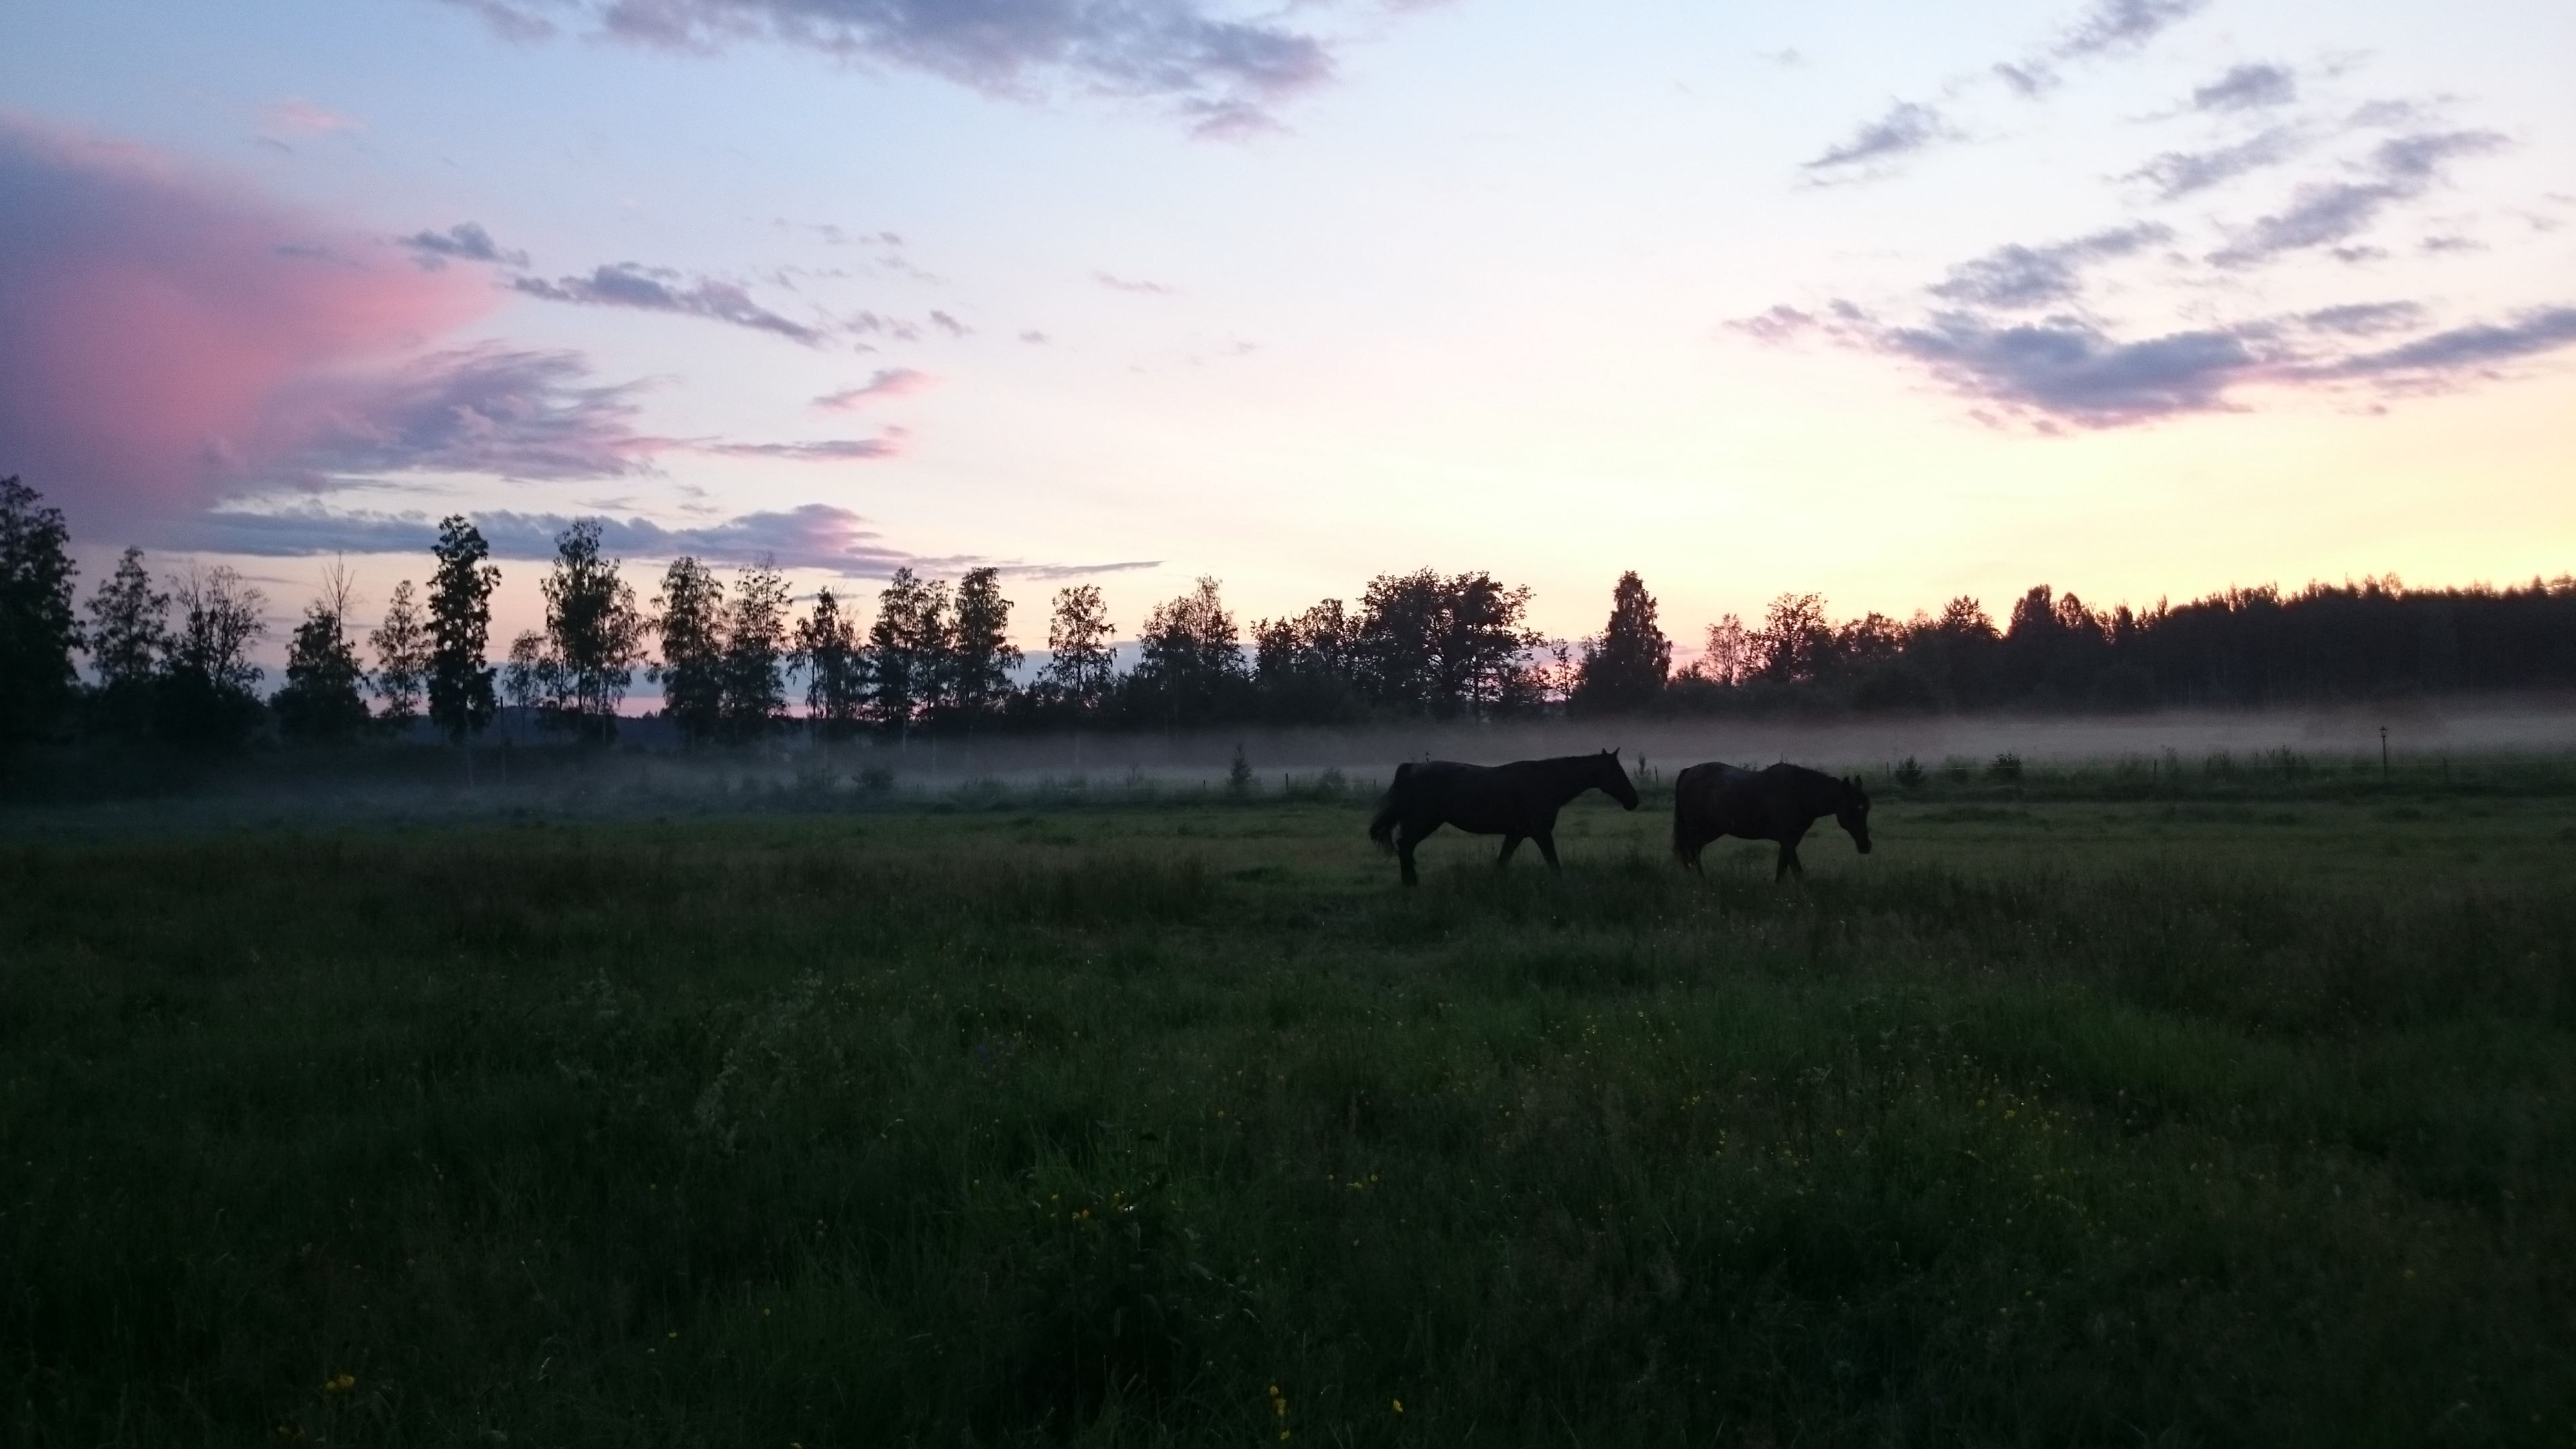 Healing genom hästar (equine therapy)